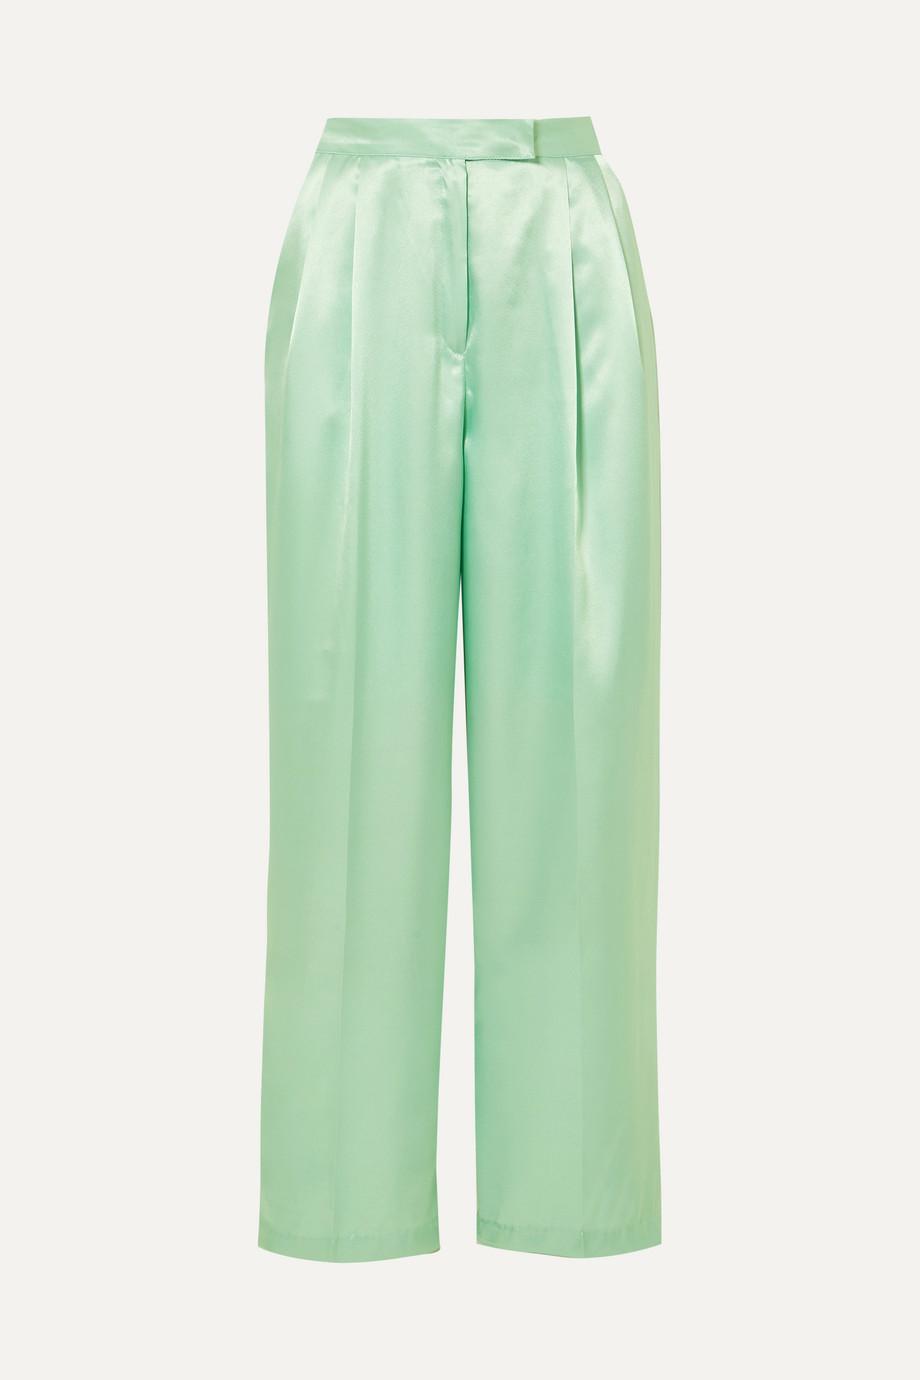 Frankie Shop Karen satin wide-leg pants